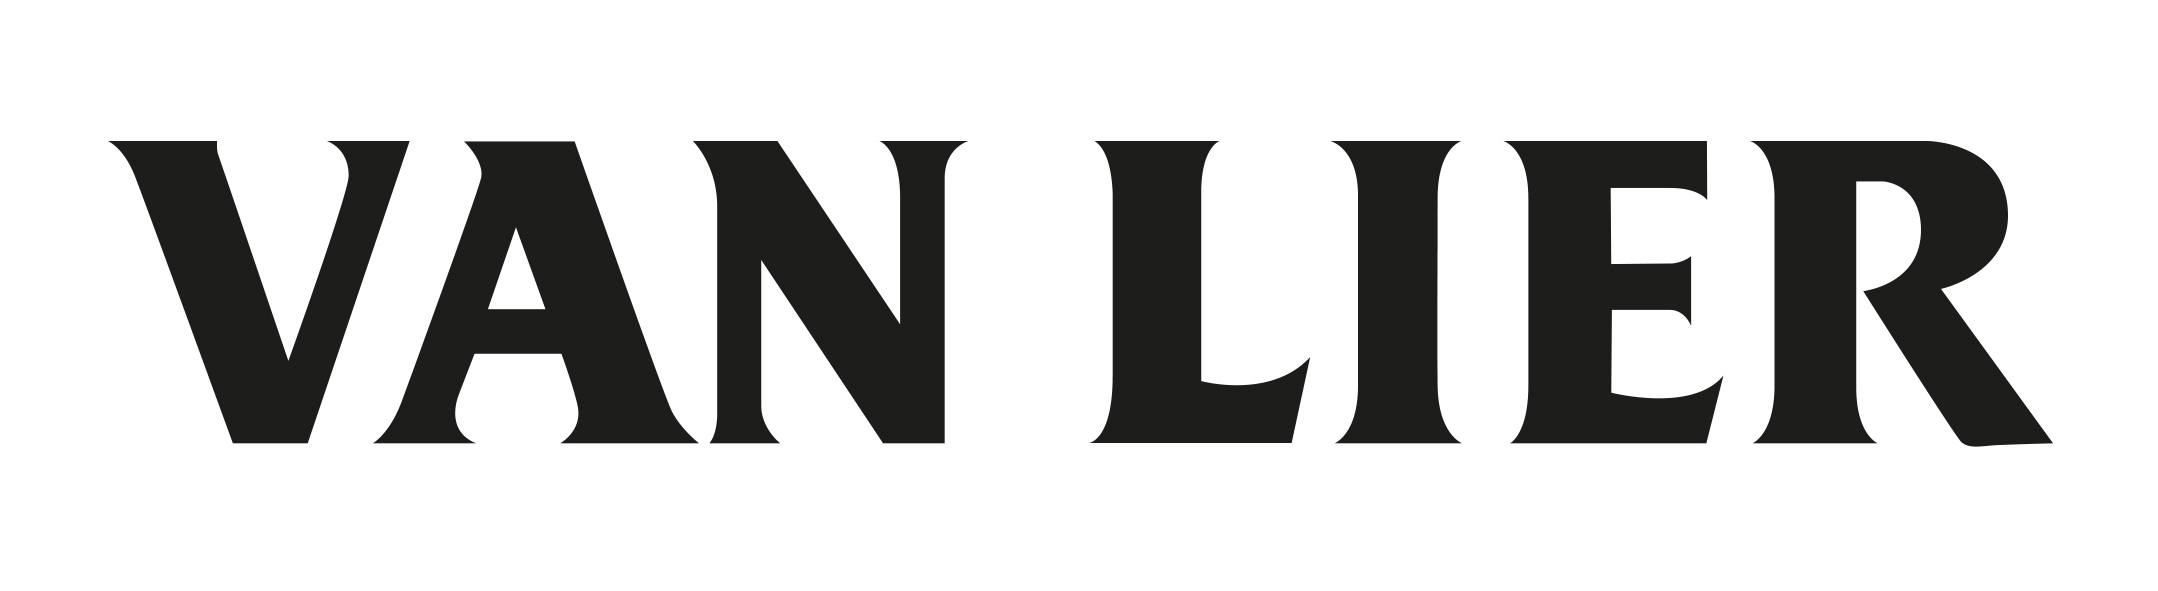 VLR_capital_logot